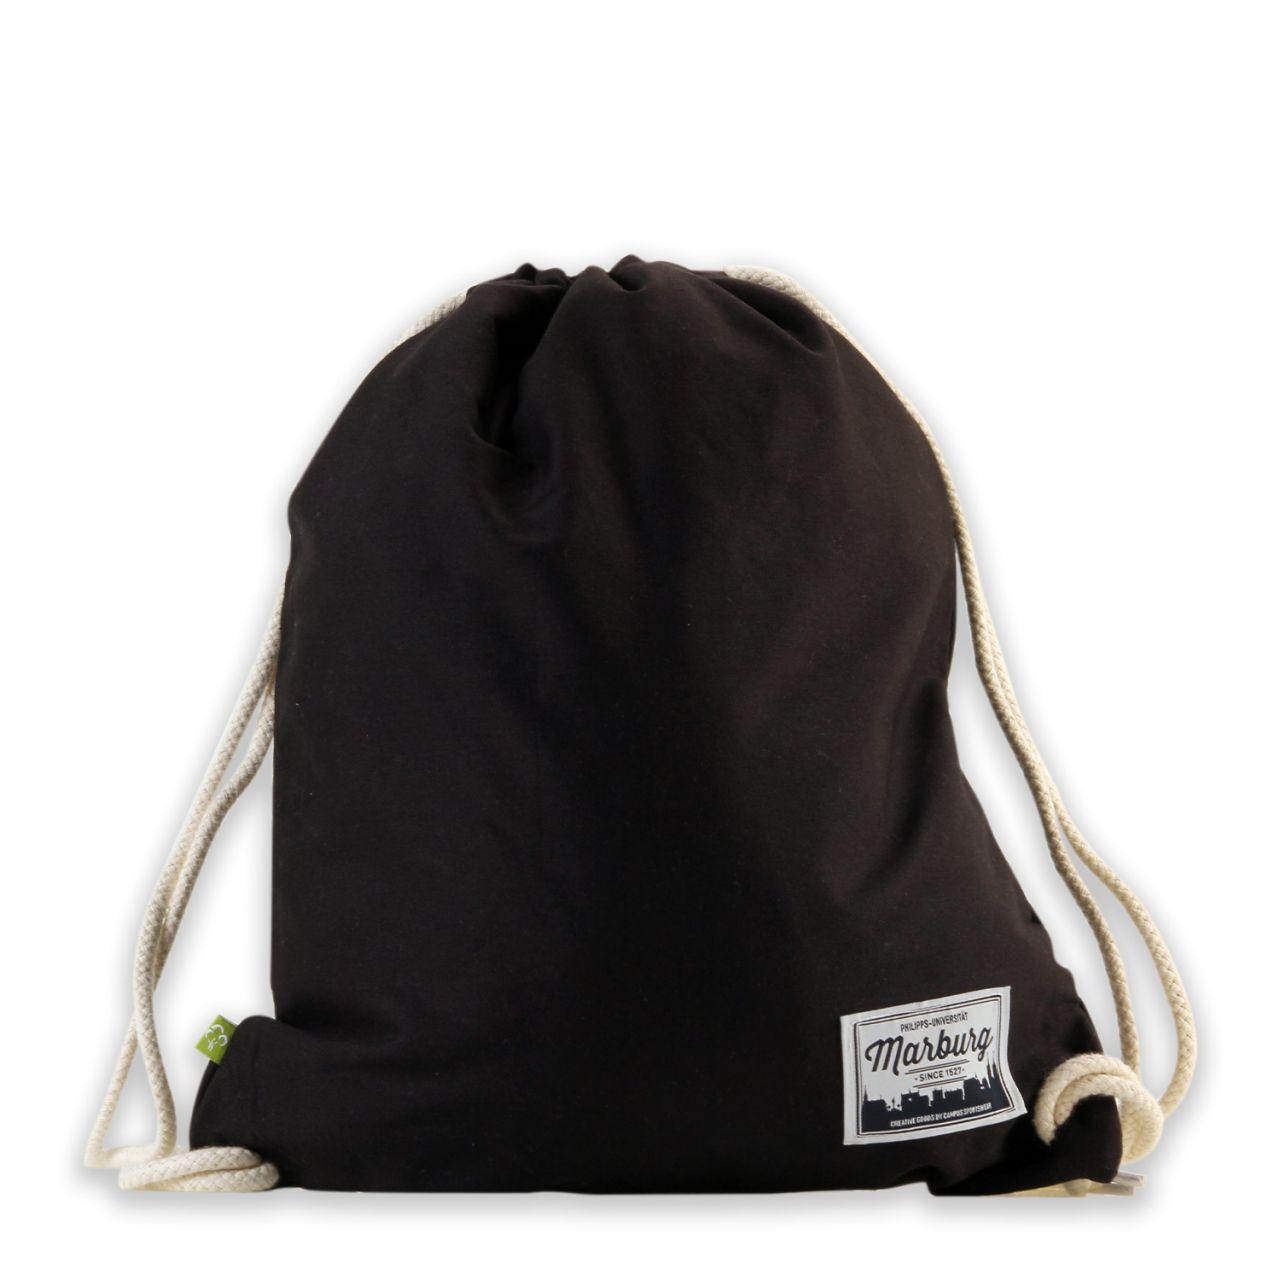 Organic Gymbag, black, label